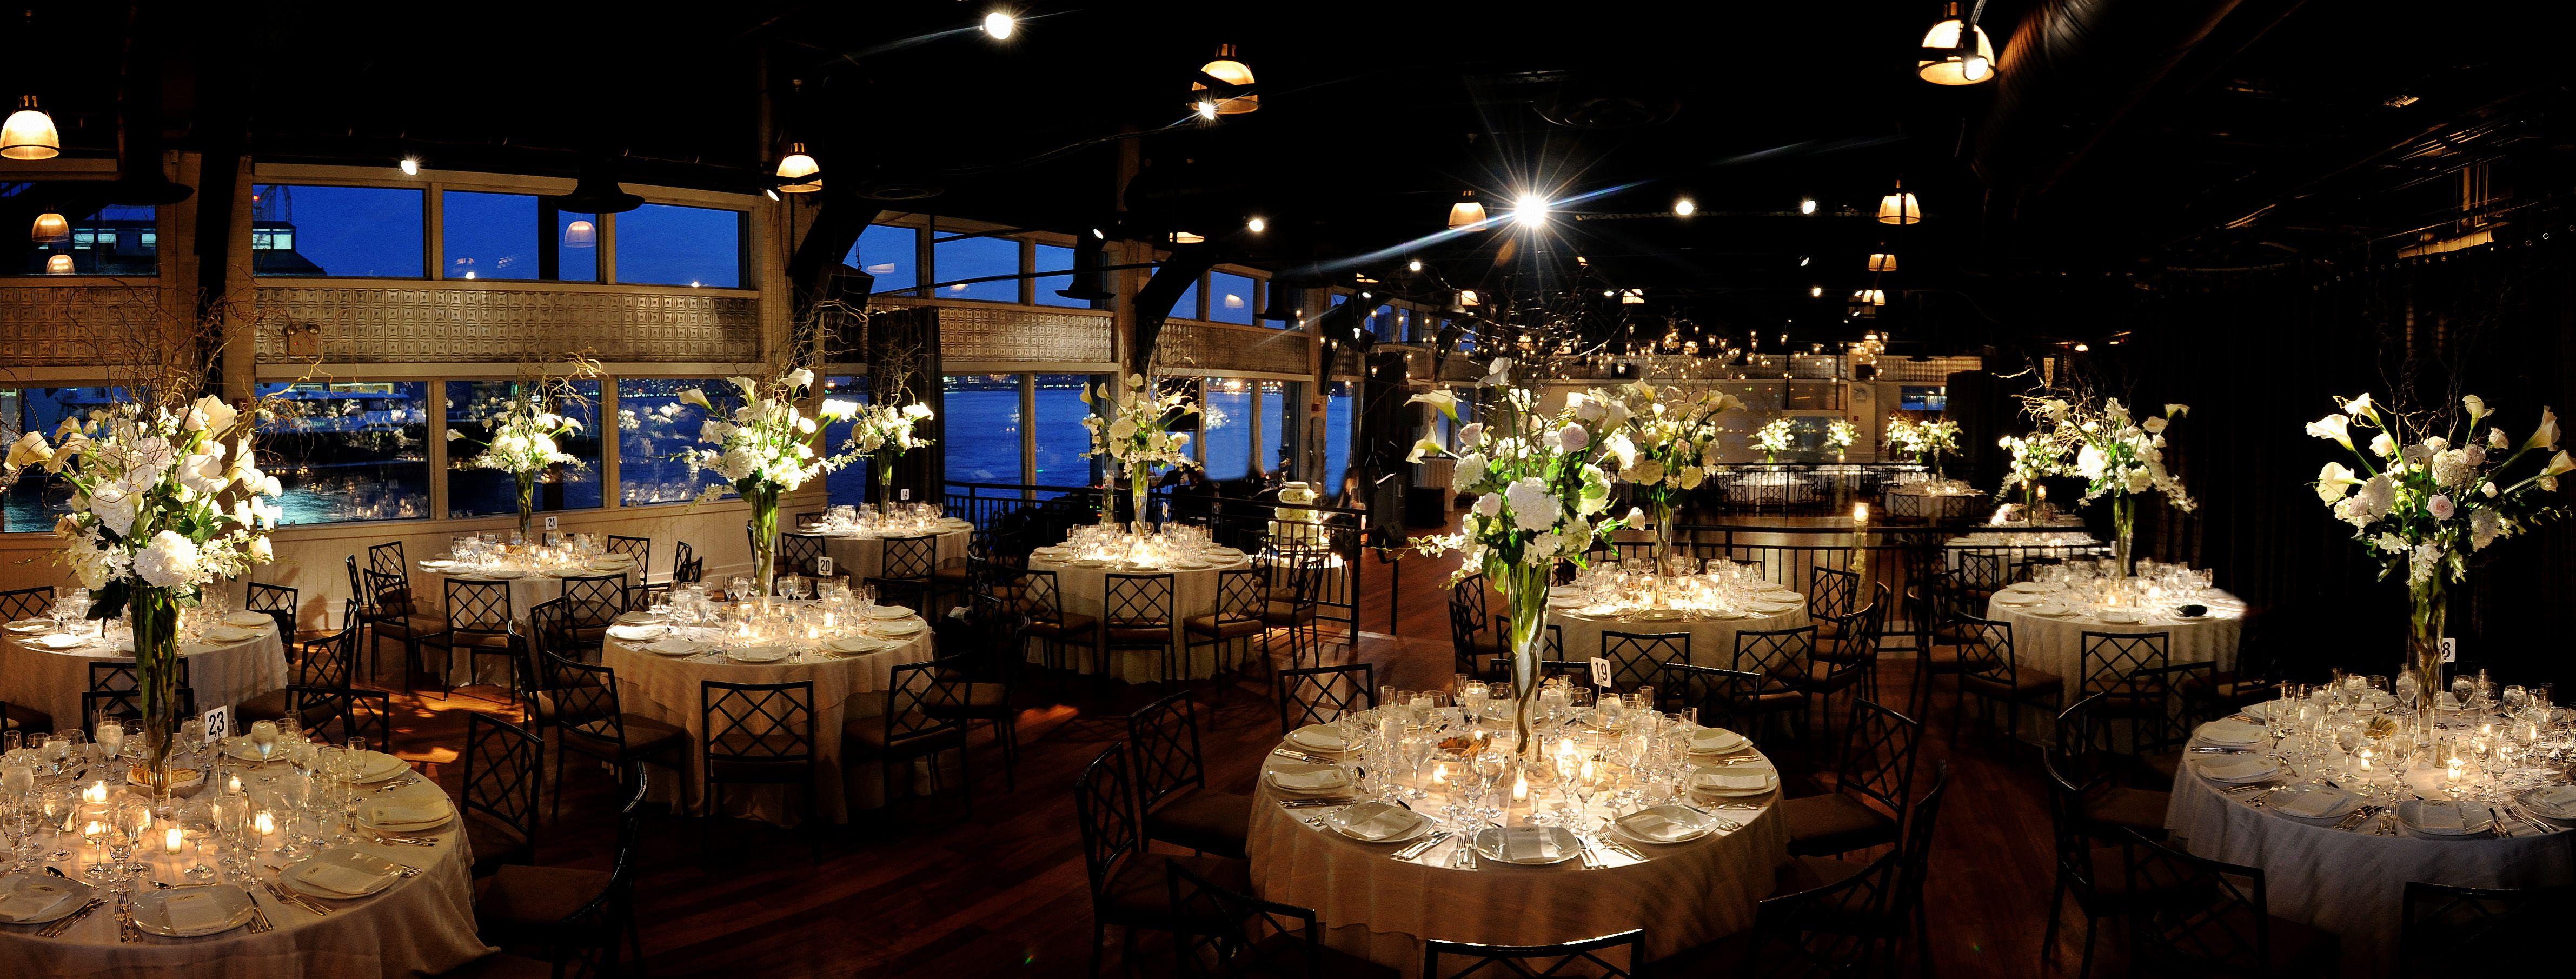 low budget wedding new jersey%0A Wedding at Weylin B  Seymour u    s   DJ Dina Regine   wedding venues    Pinterest   Dj  Wedding and Wedding venues